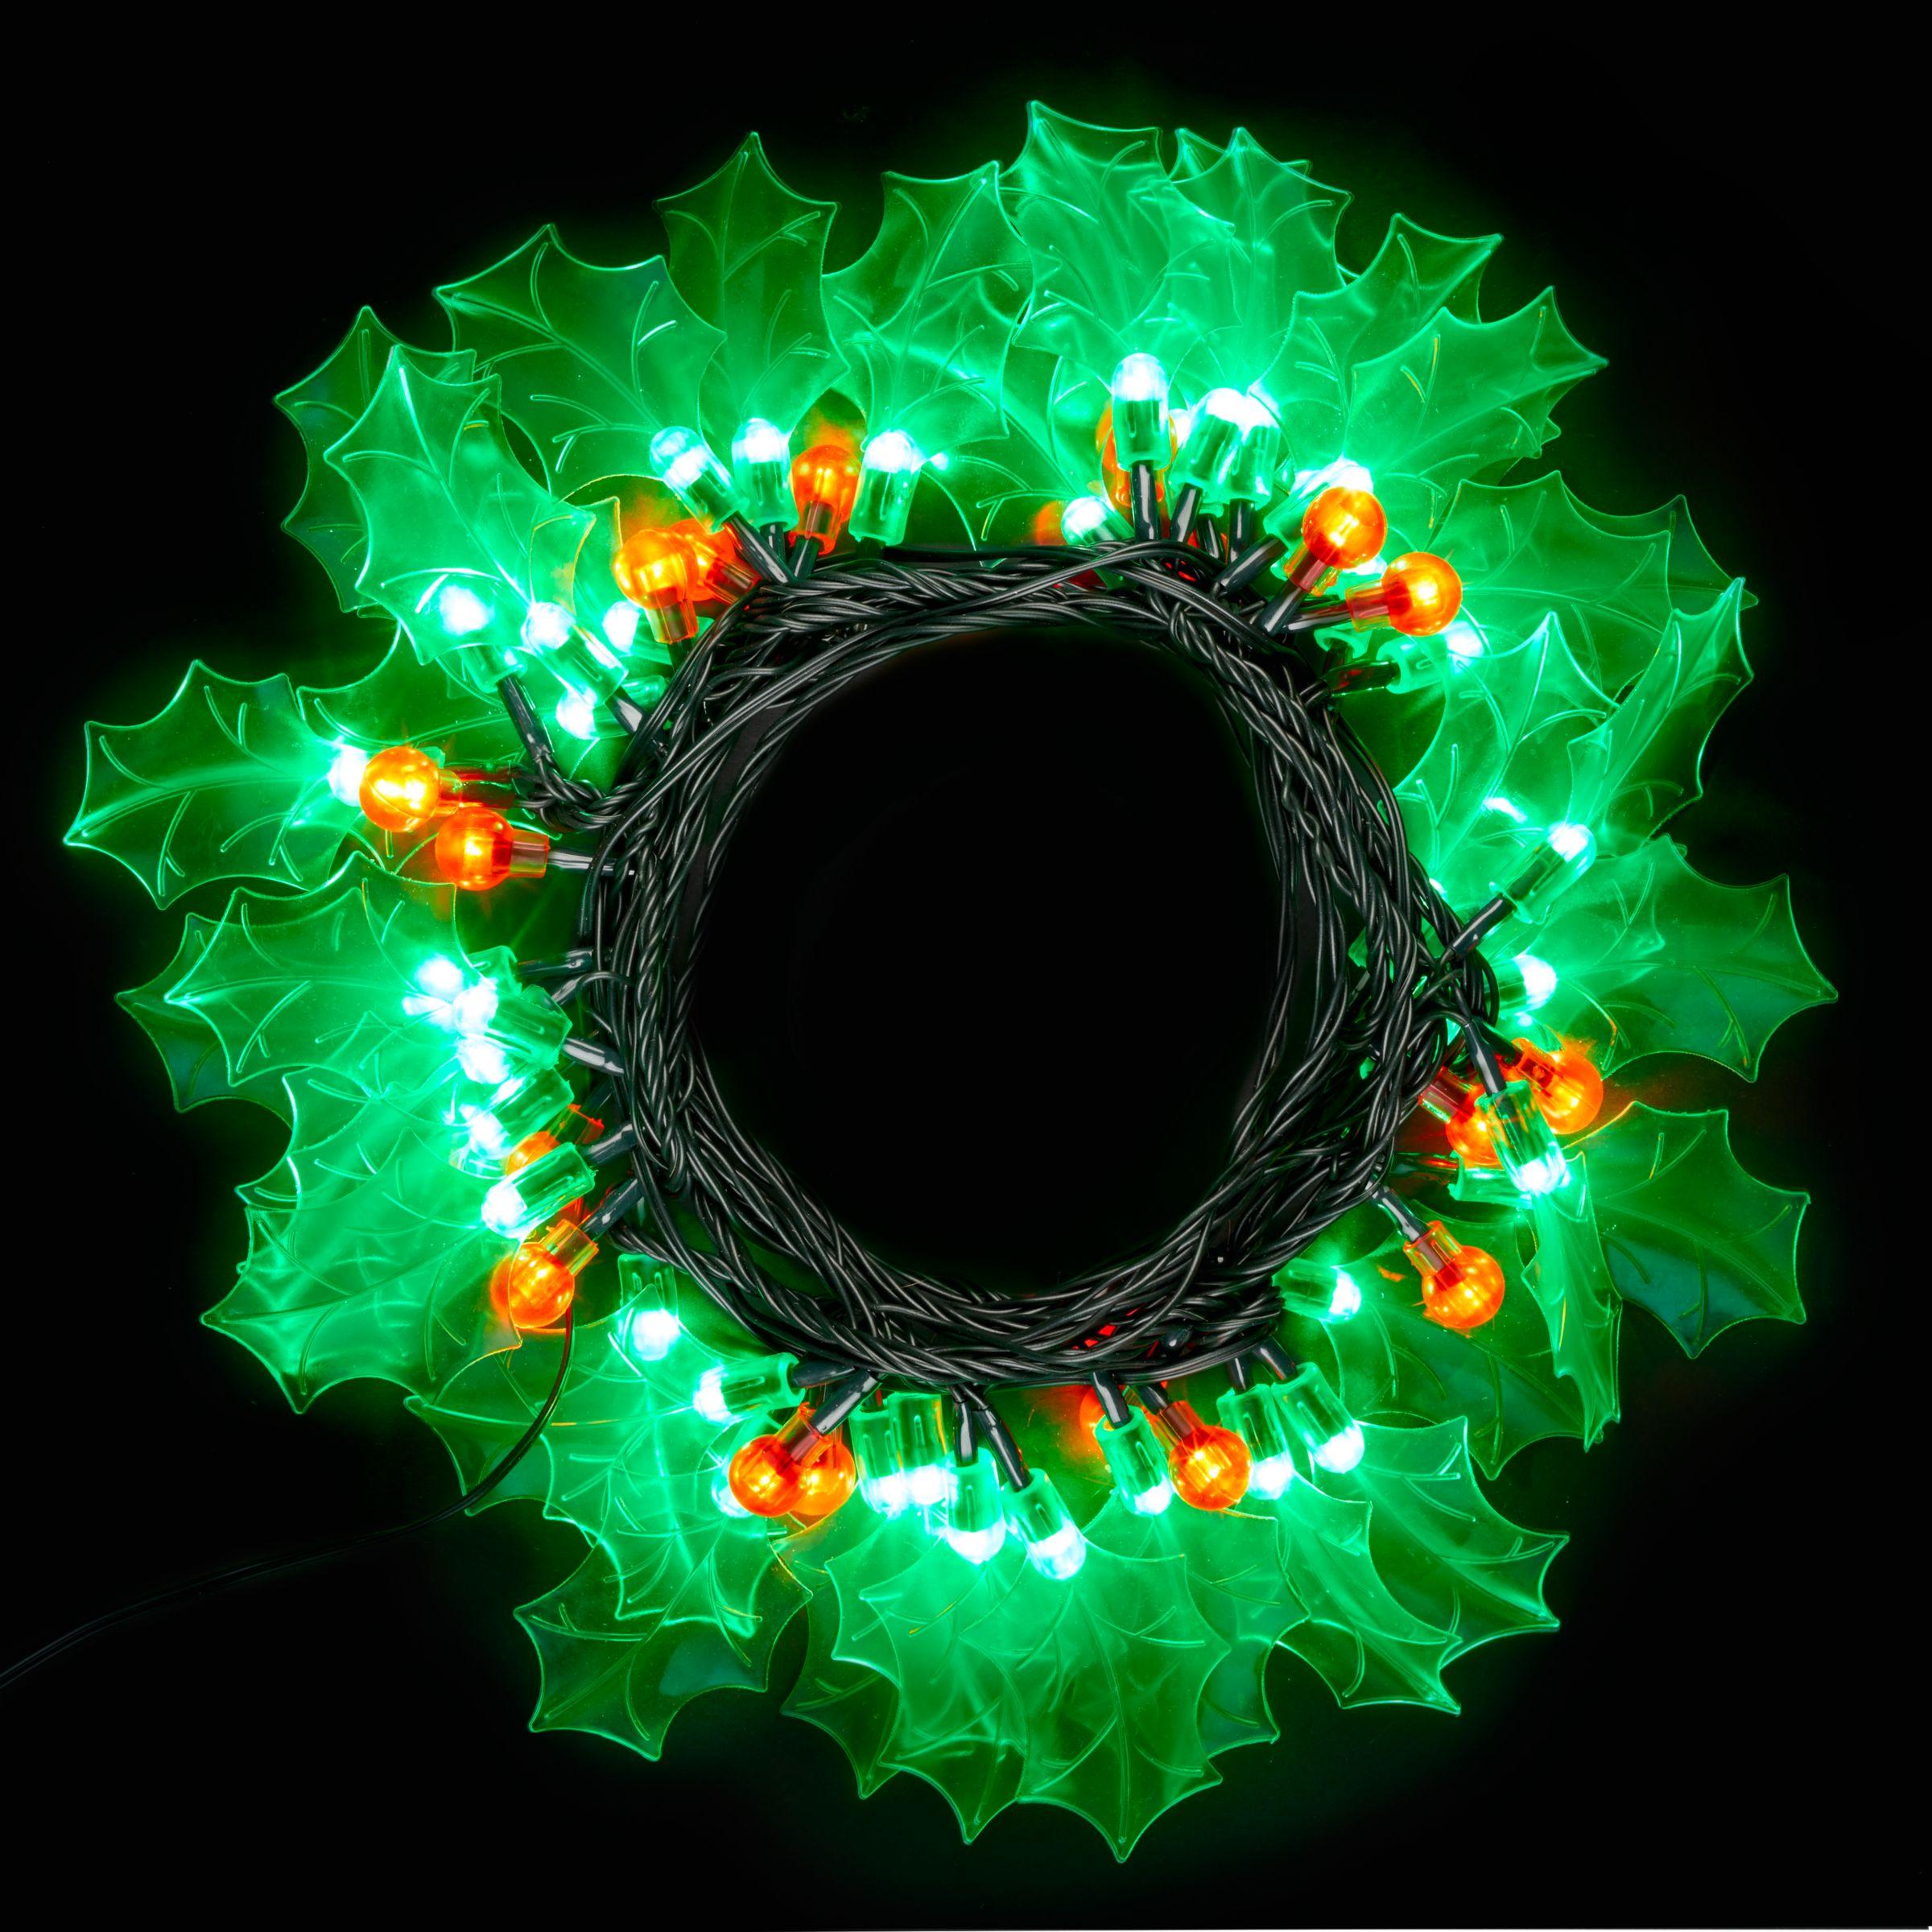 LED 'Holly' Christmas Lights, 8m